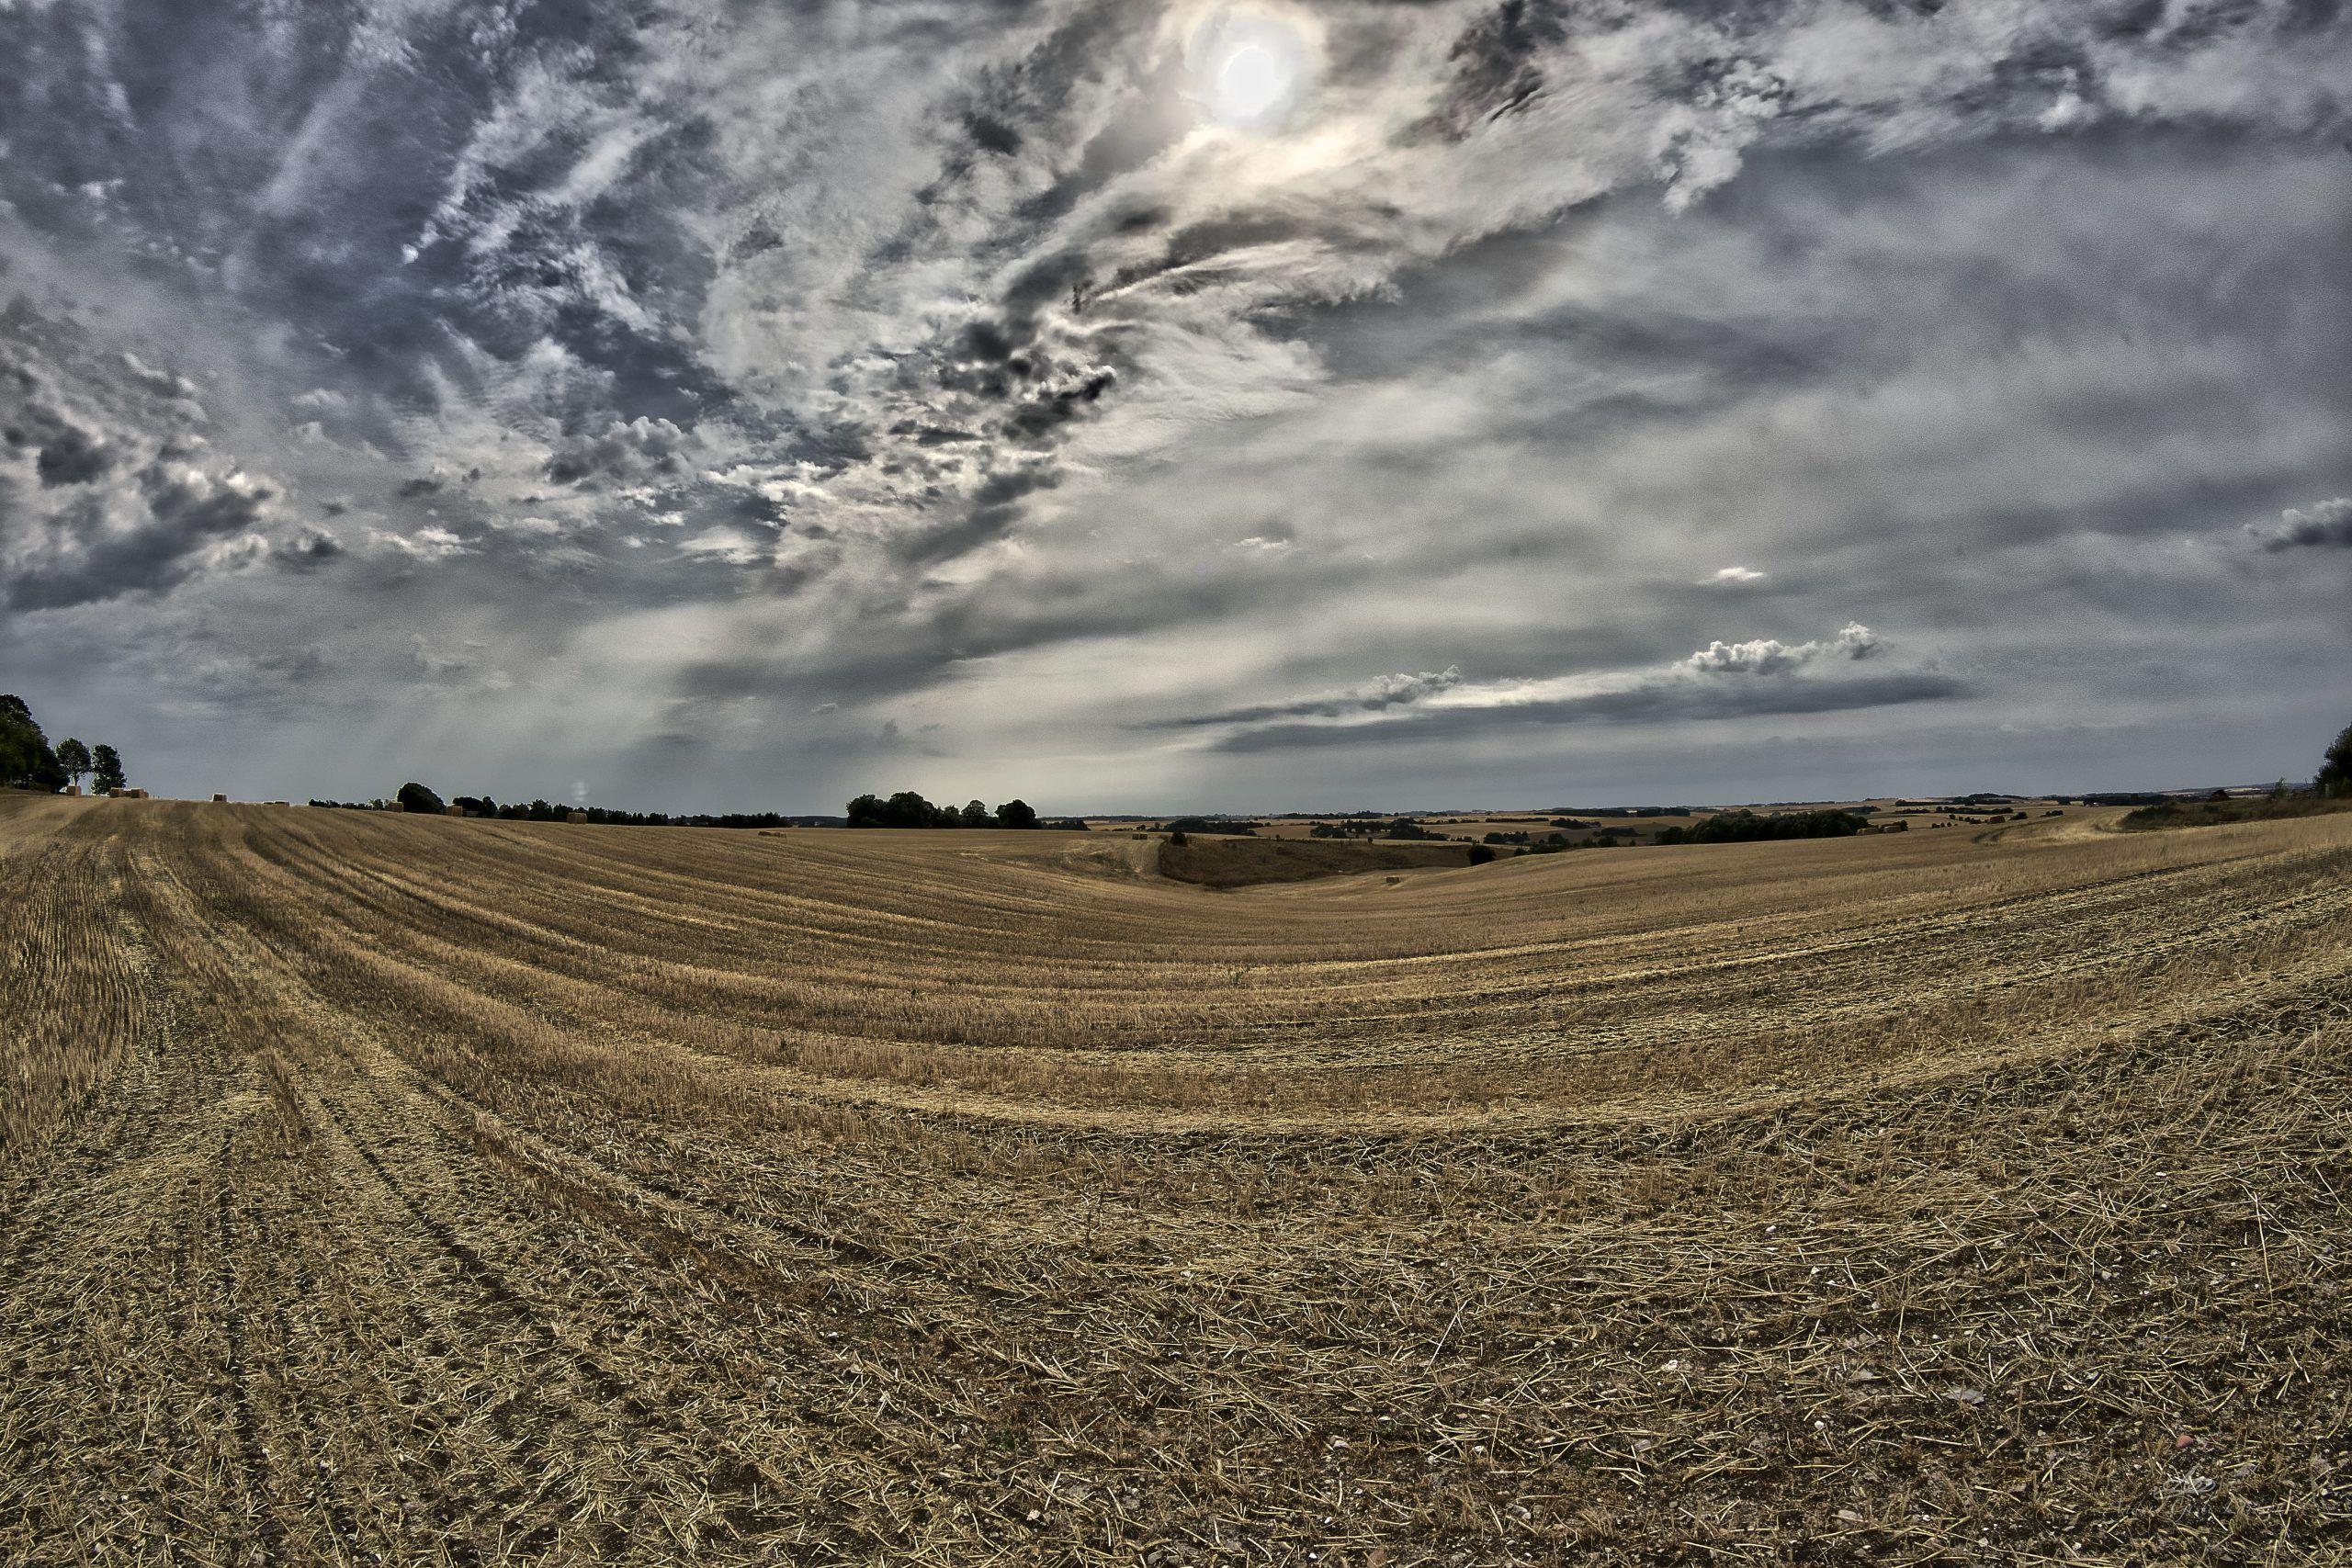 Wheat fields, 212/365, Uge 31, Sønderhede, Lime, Randers- Samyang 12mm/F2.8 Fisheye